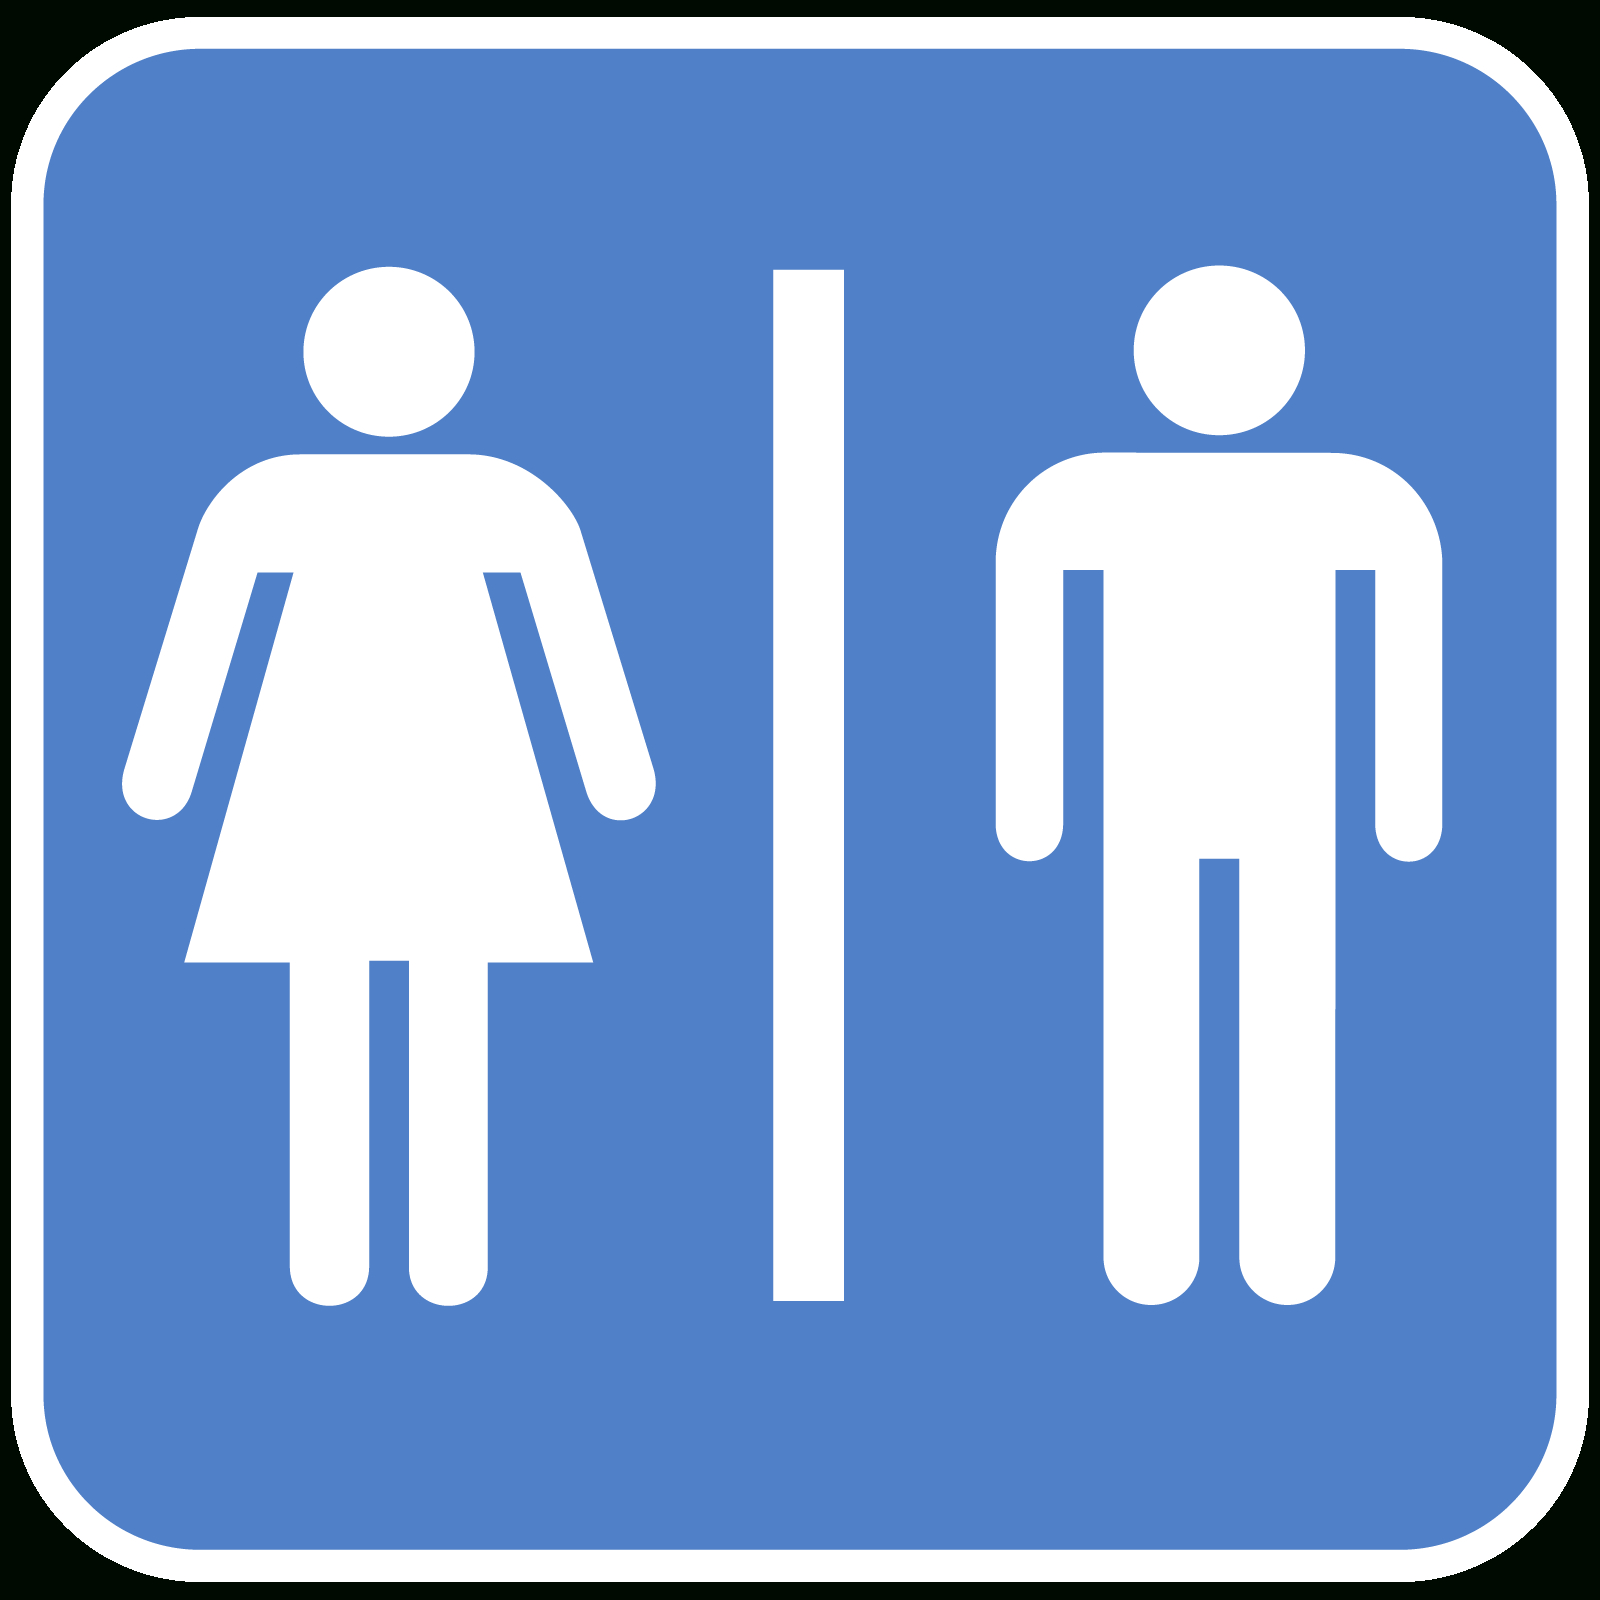 Free Free Printable Restroom Signs, Download Free Clip Art, Free - Free Printable No Restroom Signs